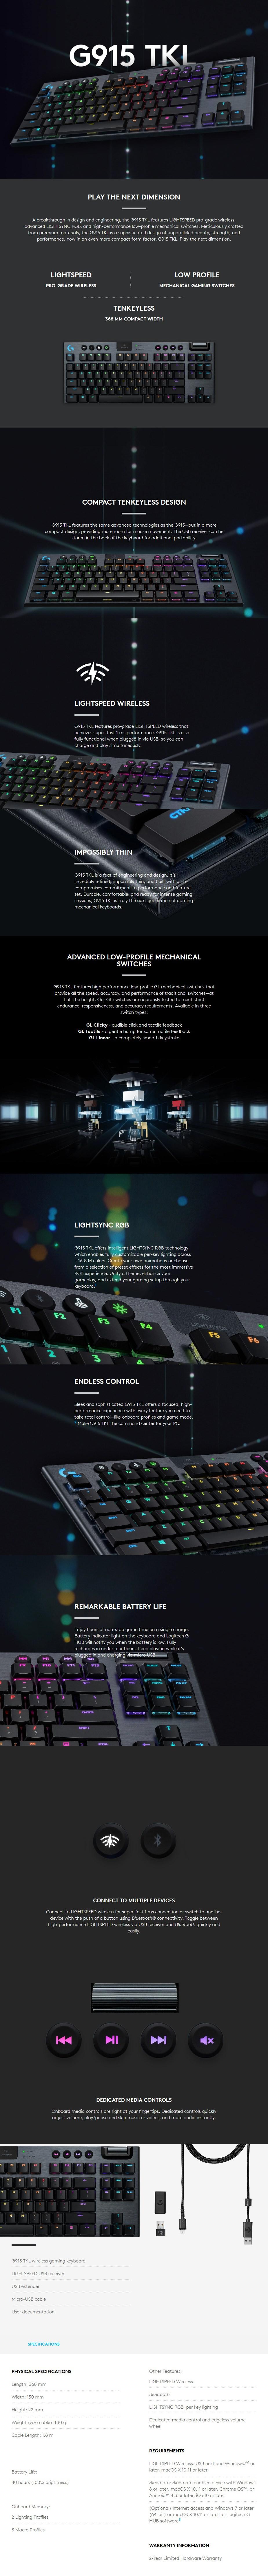 logitech-g915-tkl-lightspeed-wireless-mechanical-gaming-keyboard-gl-tactile-ac36246-6.jpg